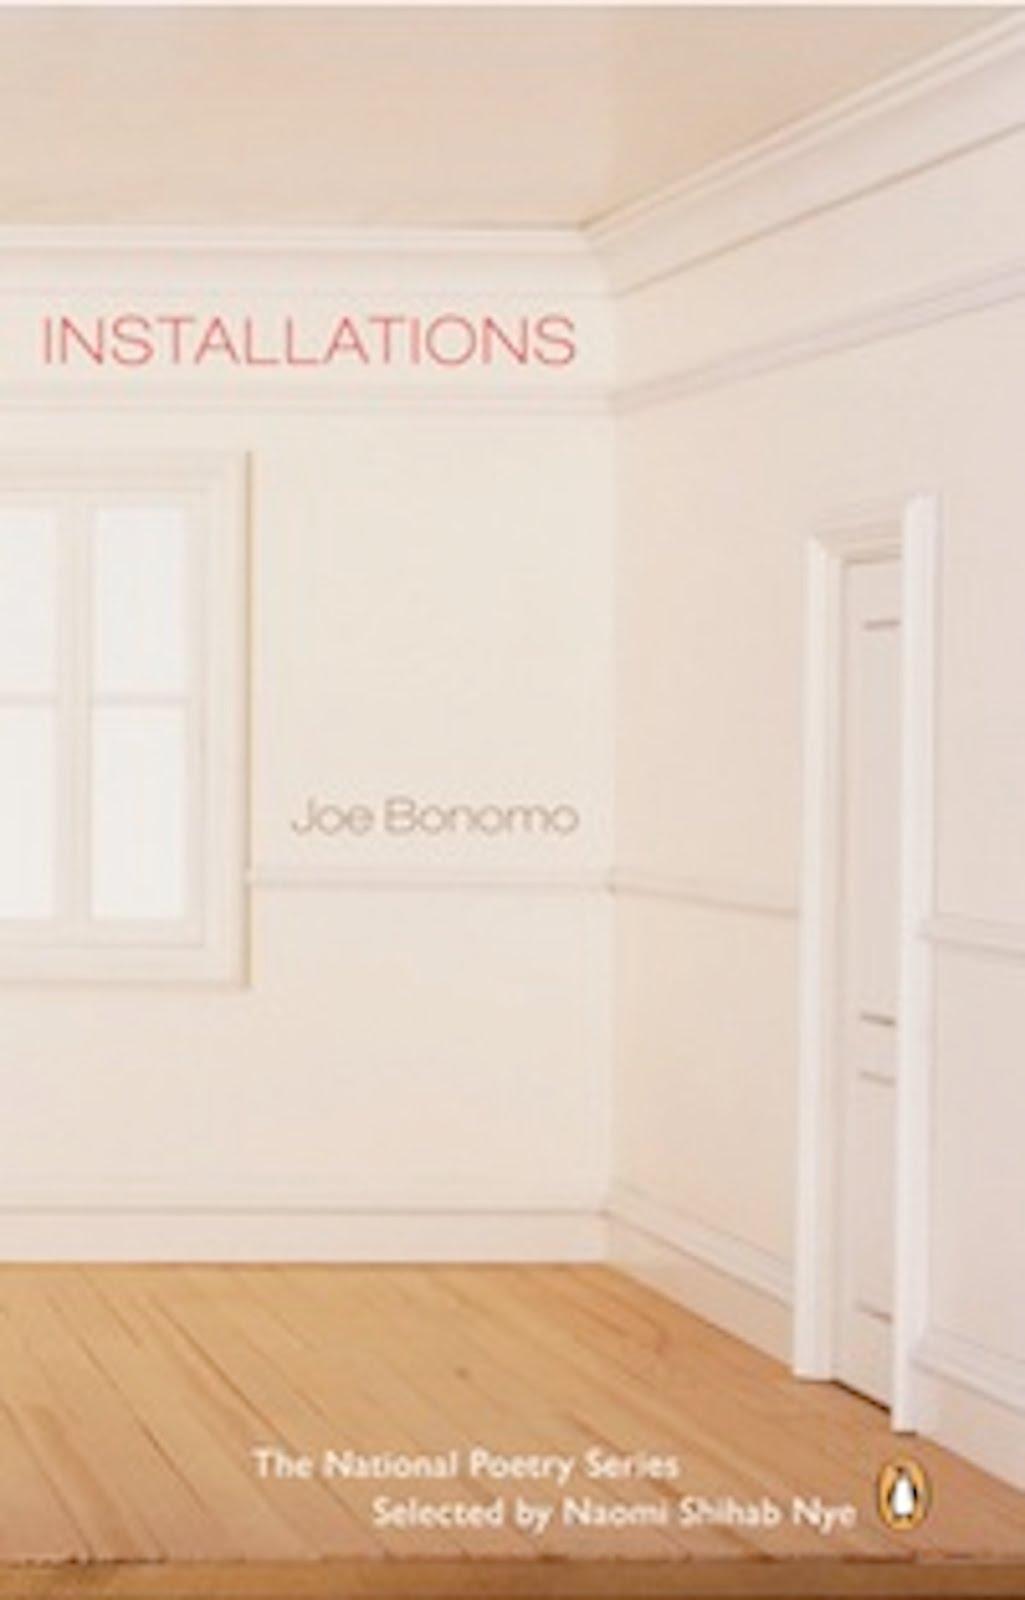 <b>Installations<b></b></b>